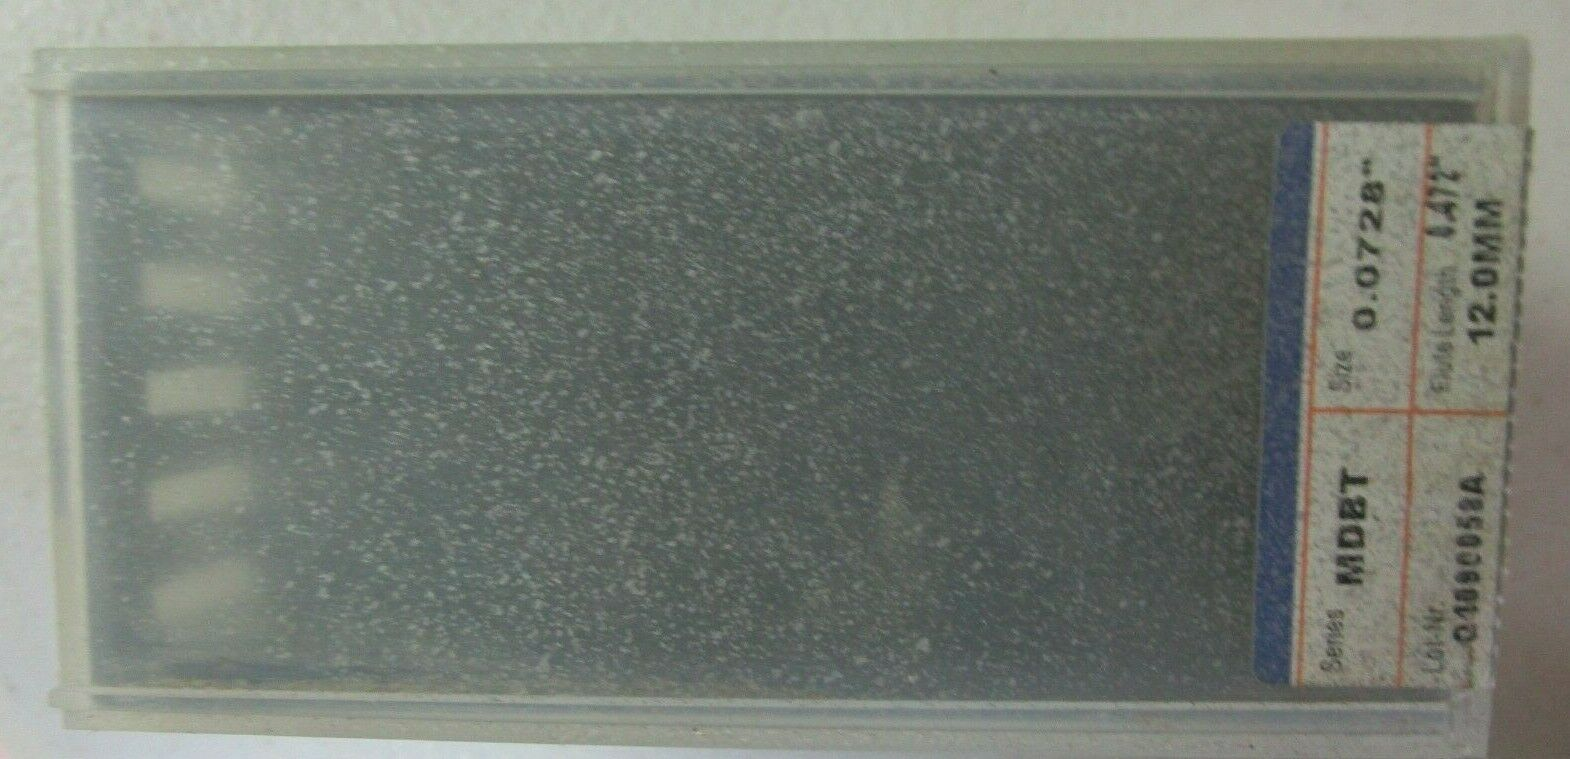 "50 Pcs .0820/"" #45 Carbide PC Board Drill Bits D0820MDBT472 Resharps"